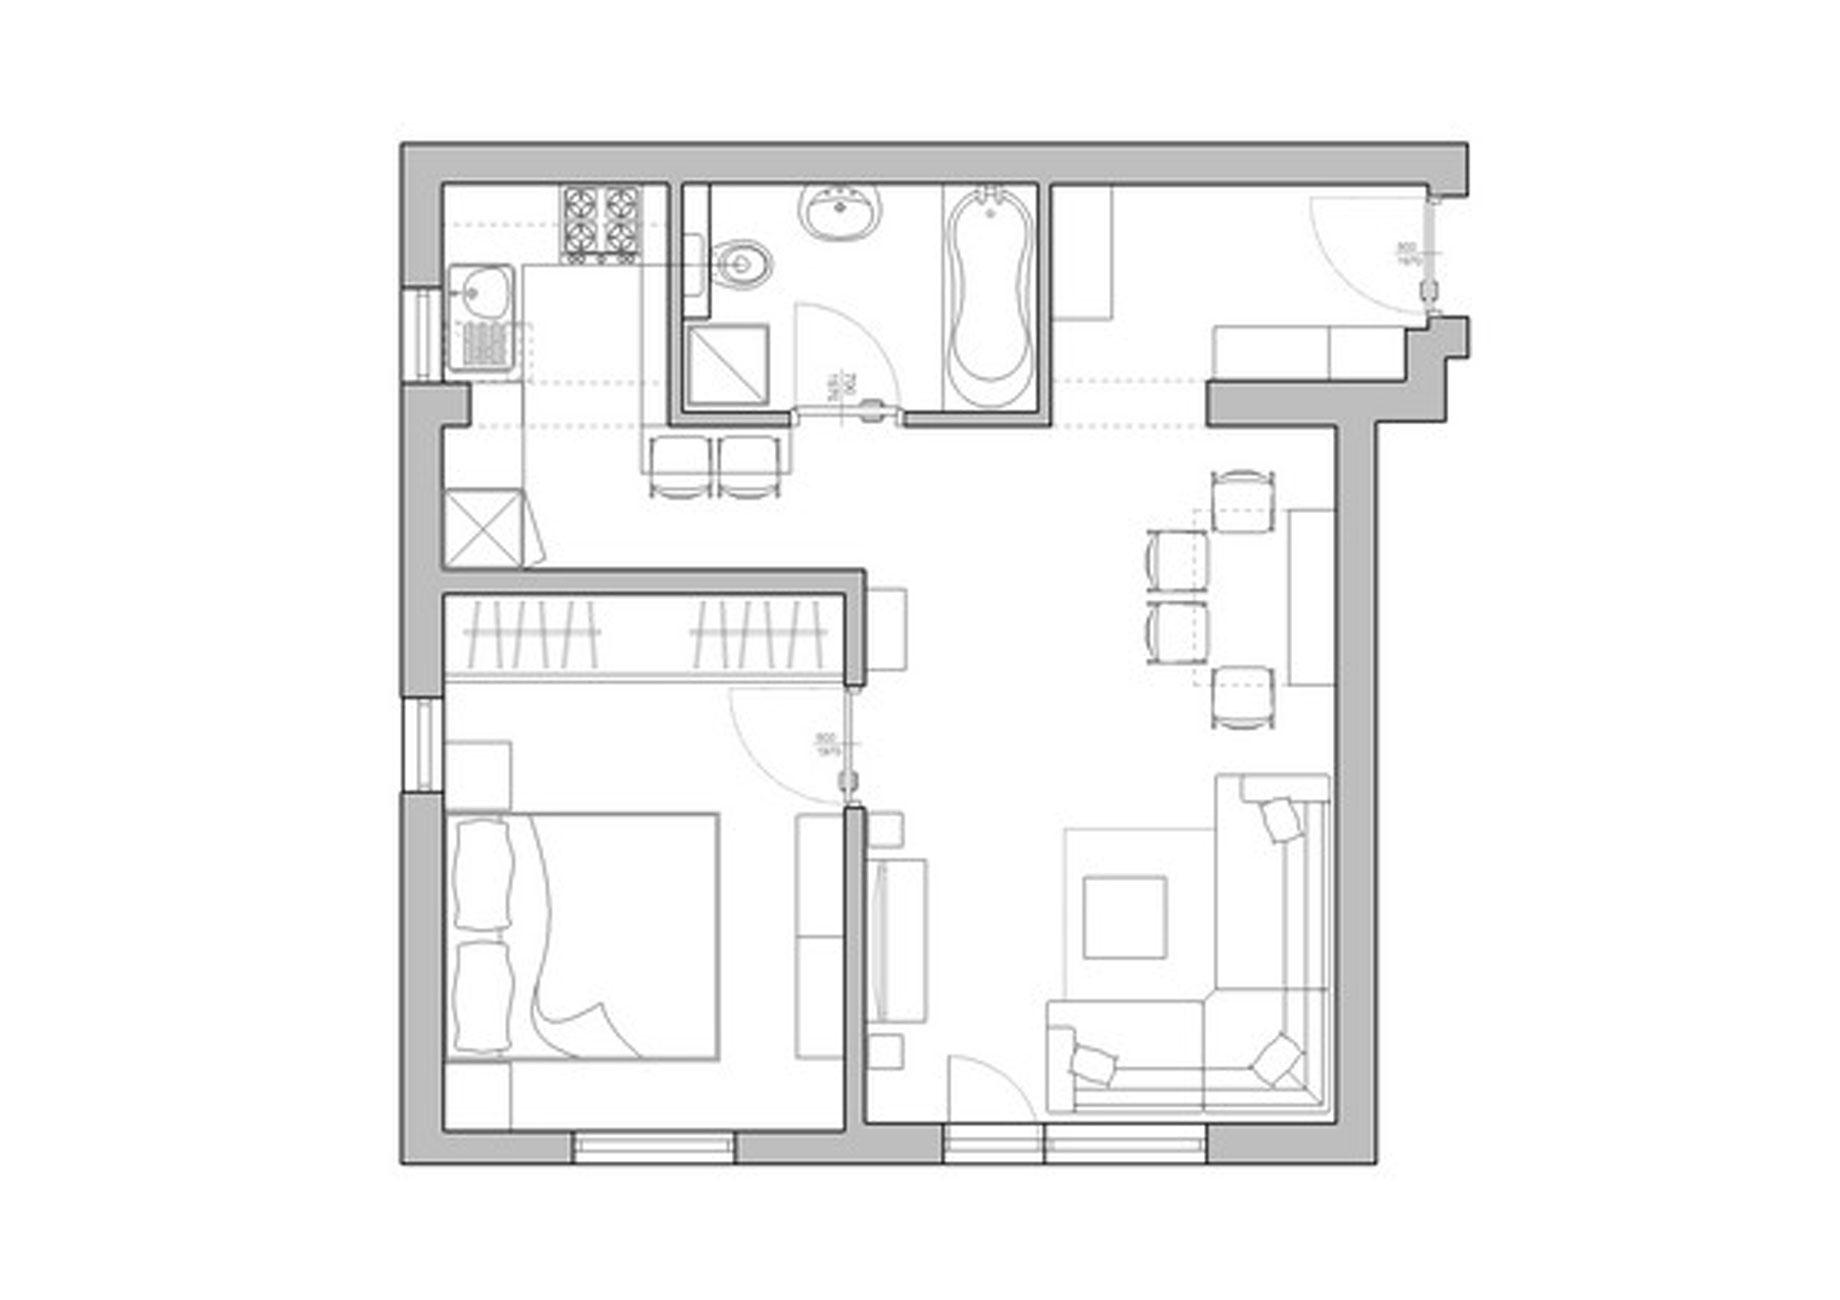 S Pdif Wiring Diagram Home Studio